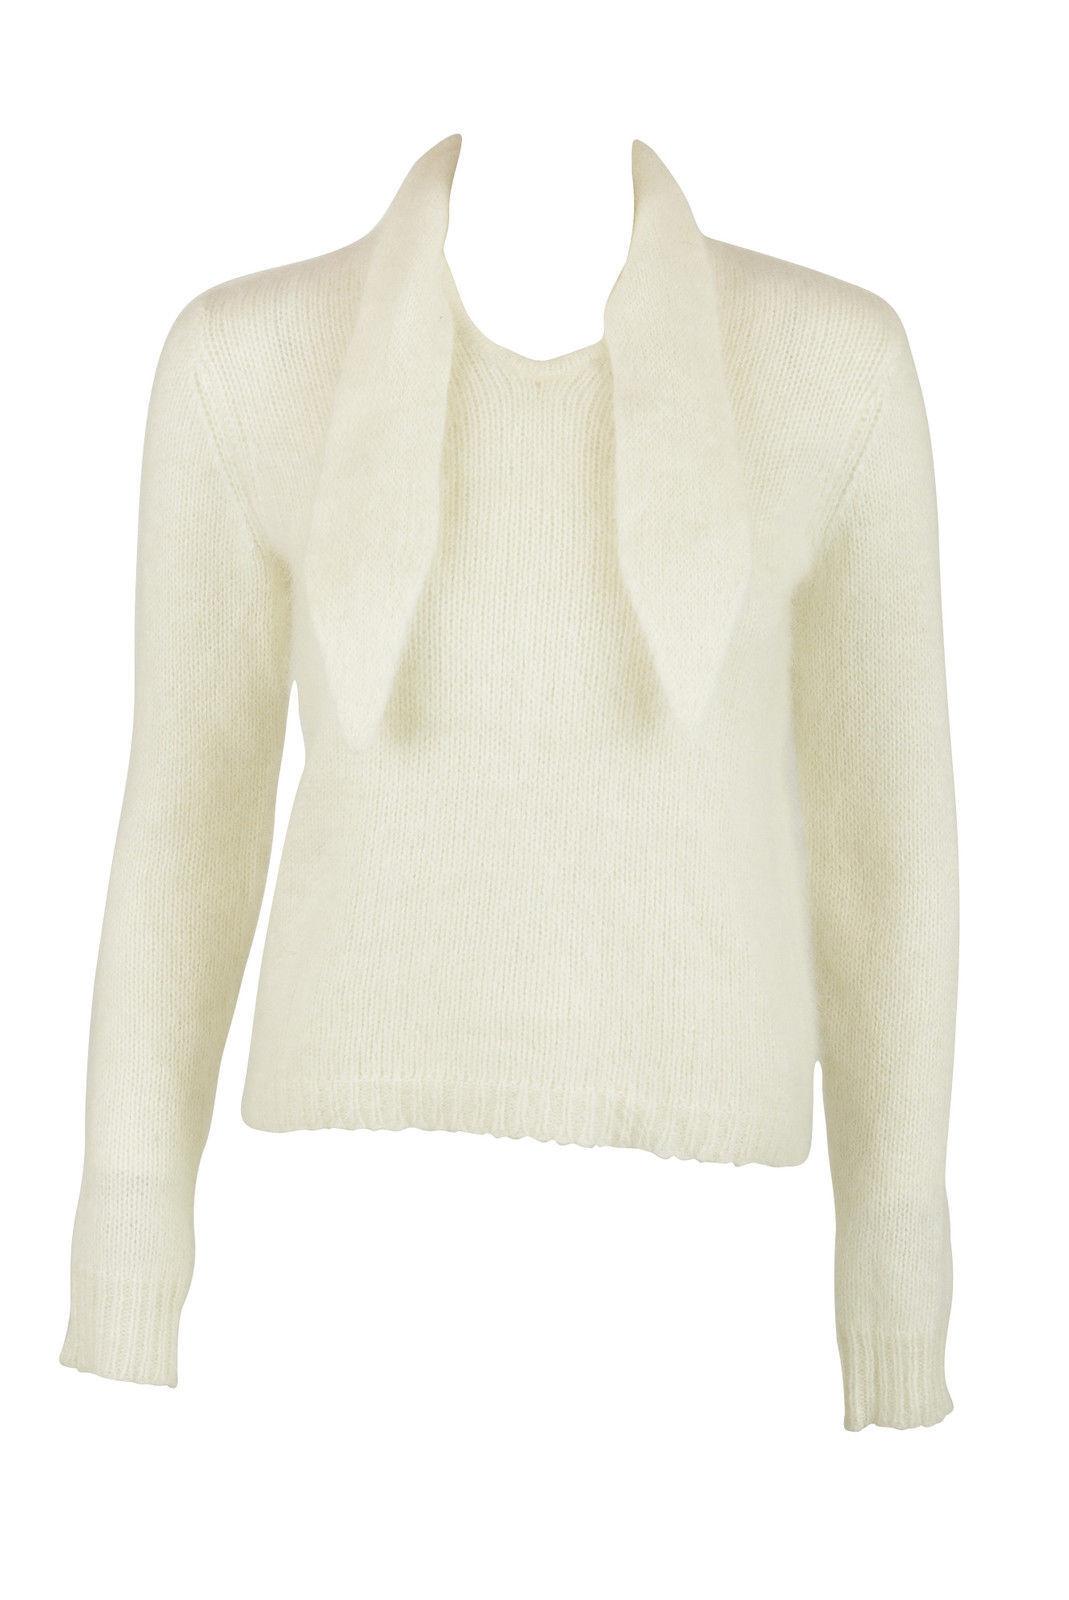 Ausverkauf Rick Cardona Poncho Shirt Pullover Spitze Gr.36 //38 38//40 ecru weiß